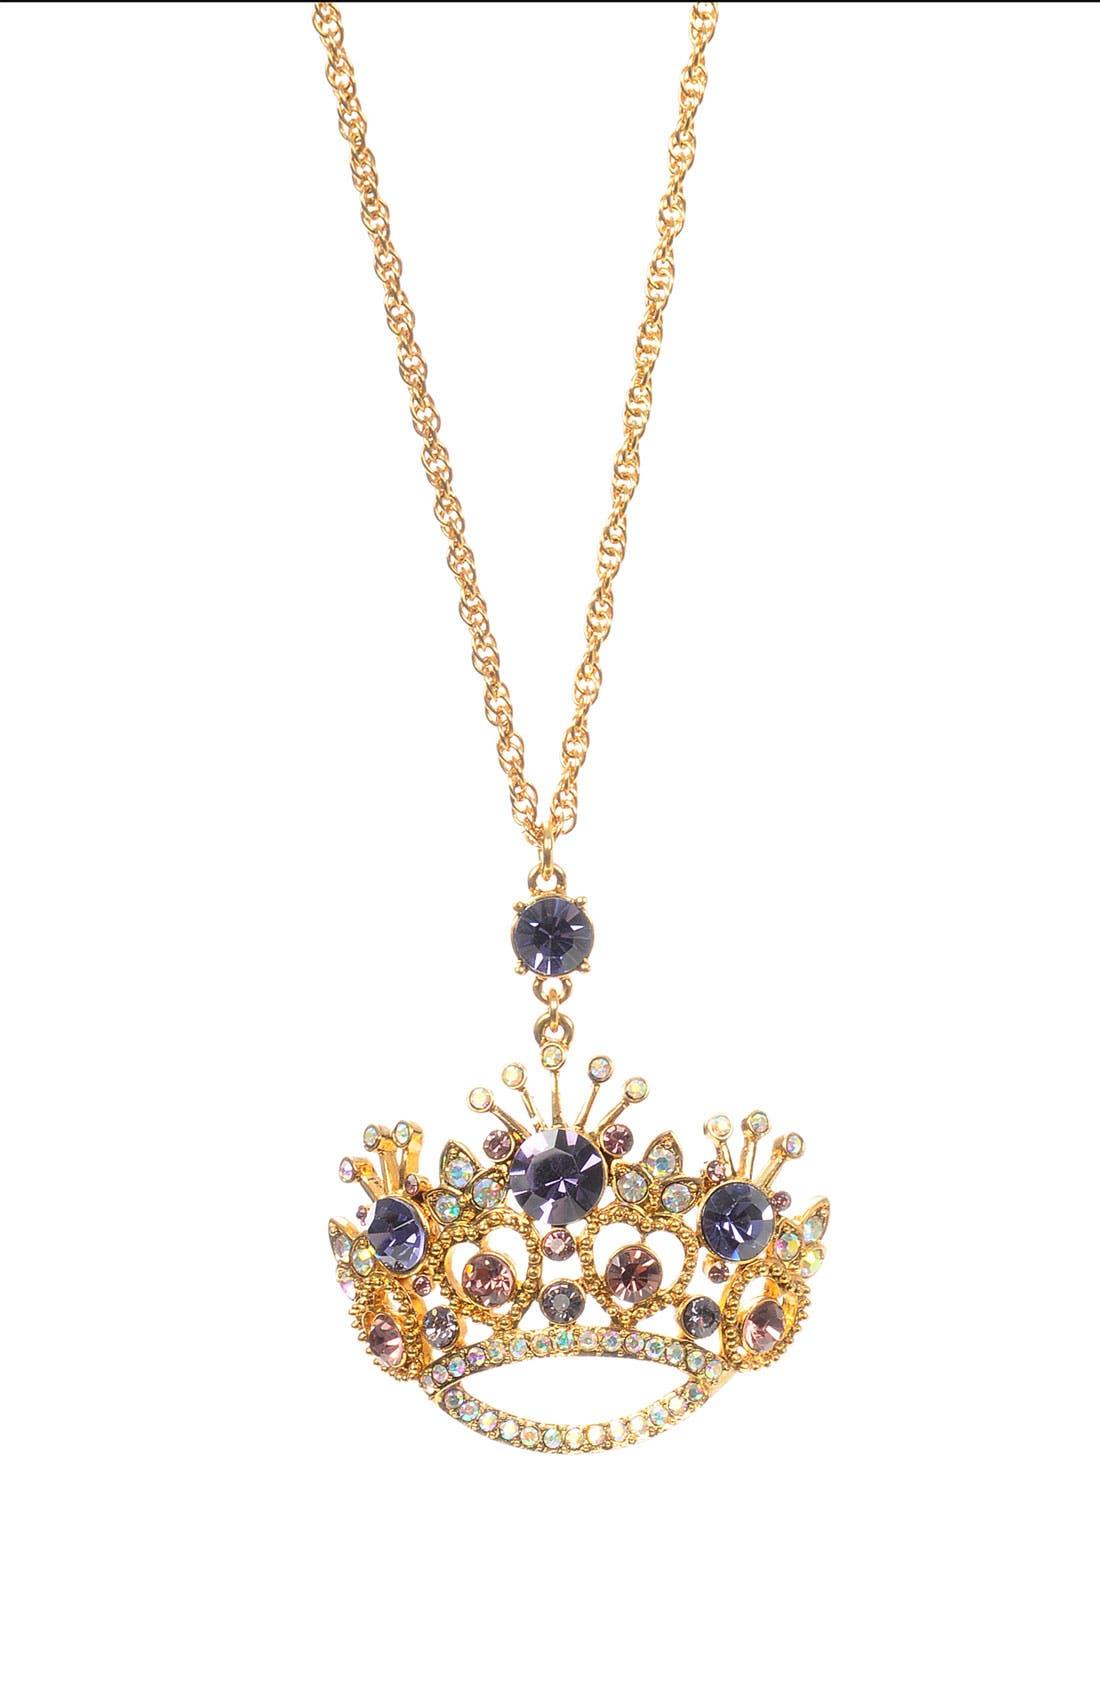 Main Image - Betsey Johnson 'Tzar' Crown Statement Pendant Long Necklace